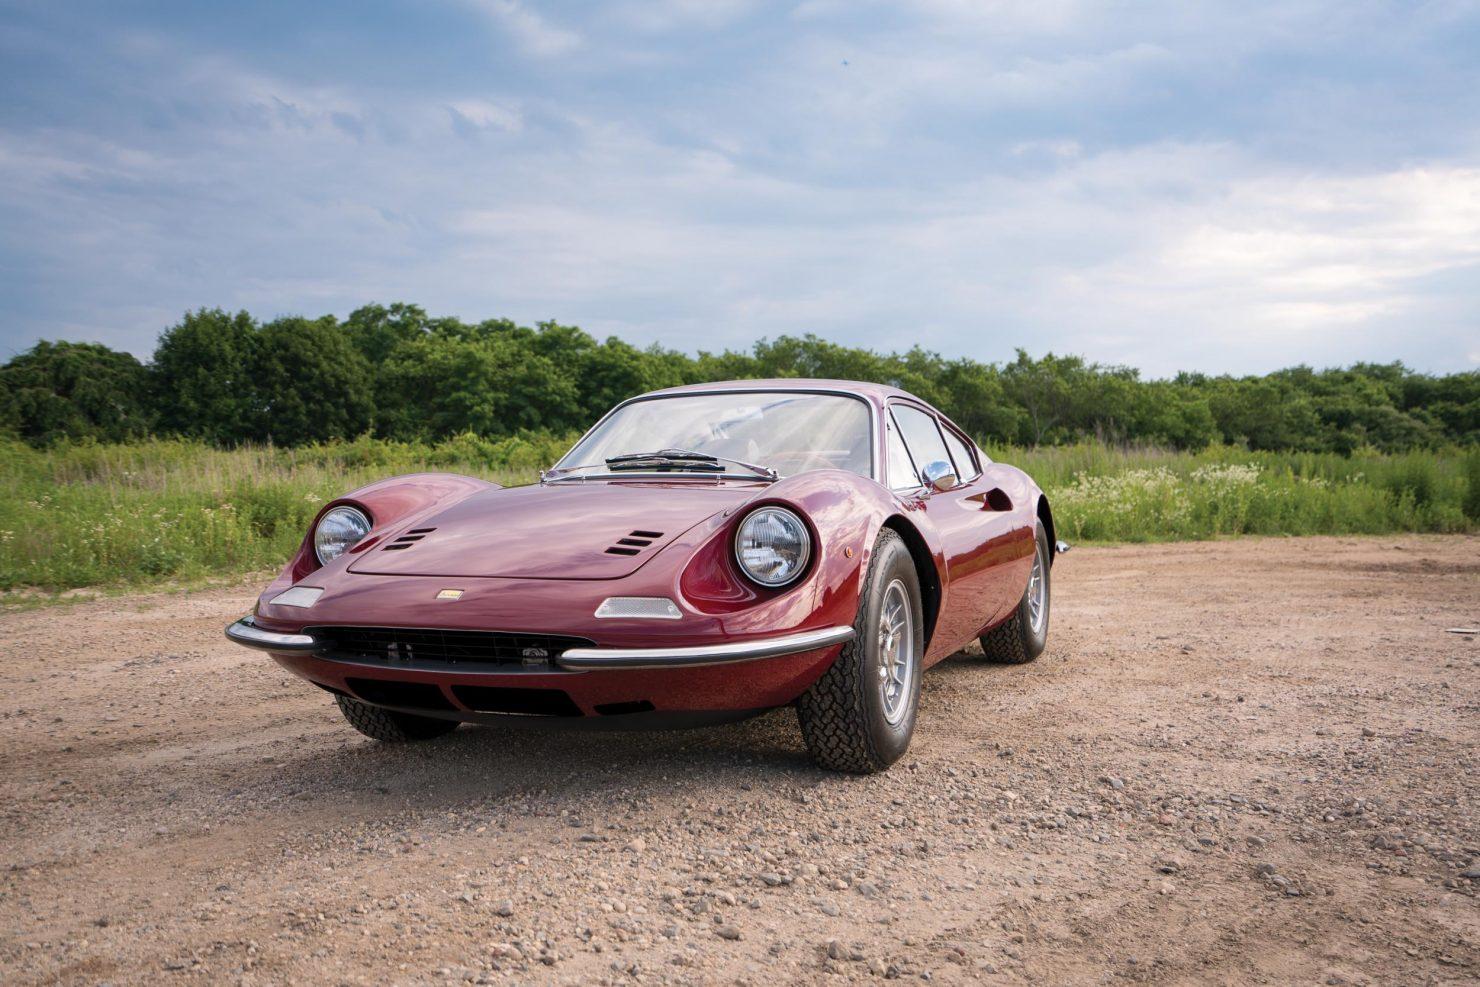 ferrari dino 246 21 1480x987 - 1969 Ferrari Dino 246 GT